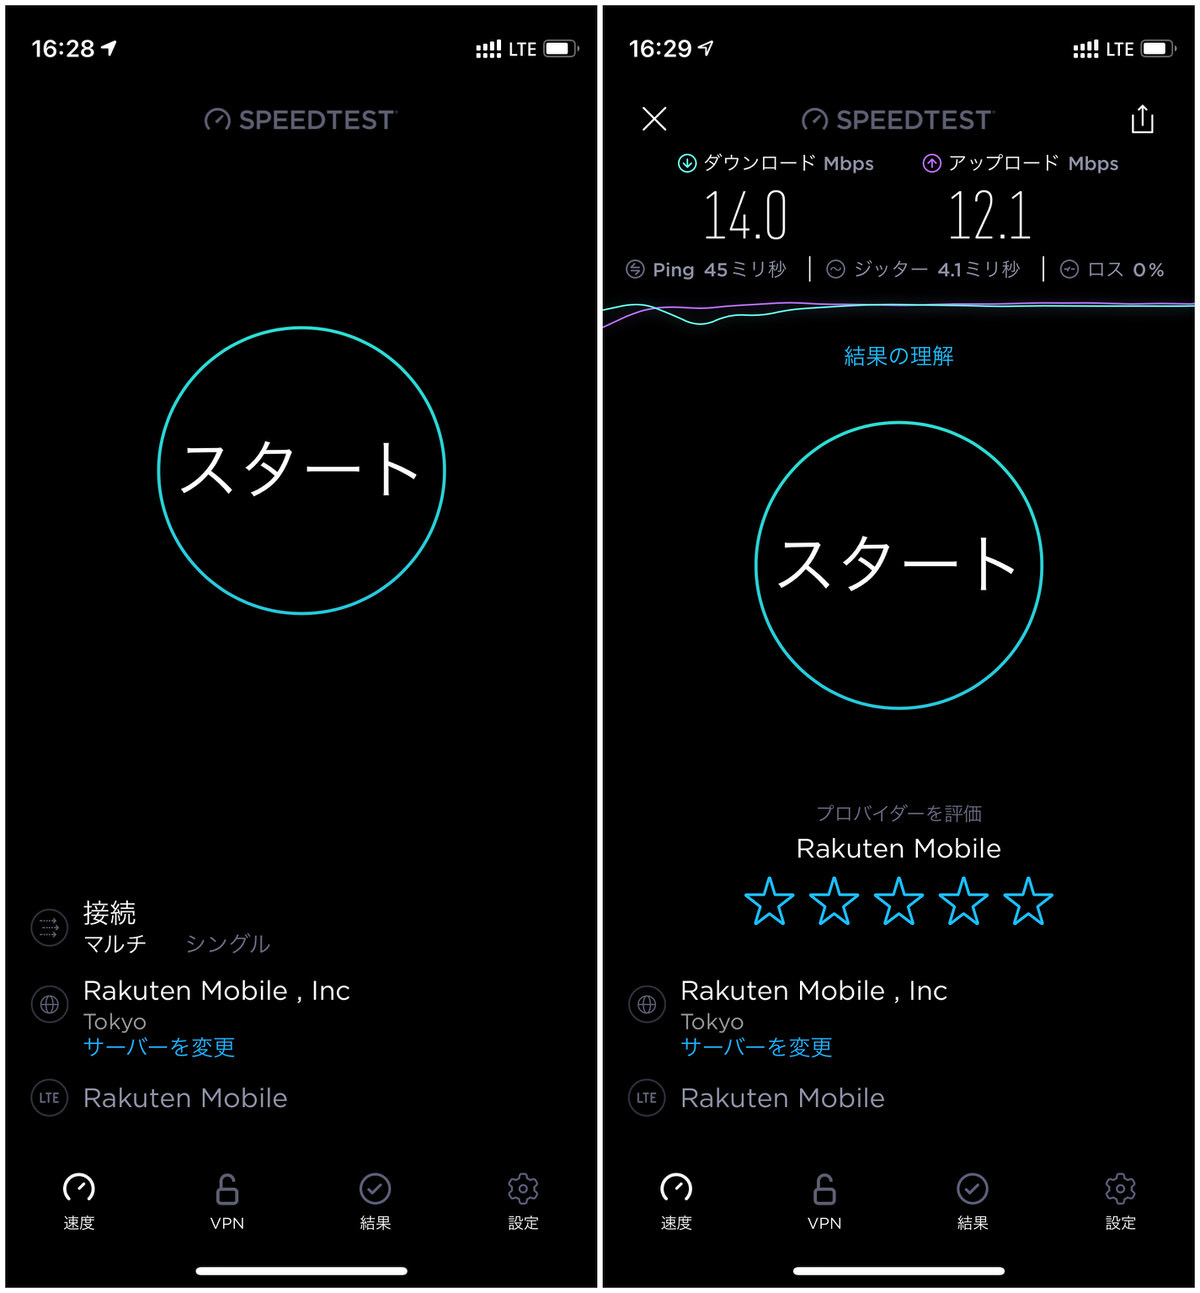 Rakuten Mobile−16